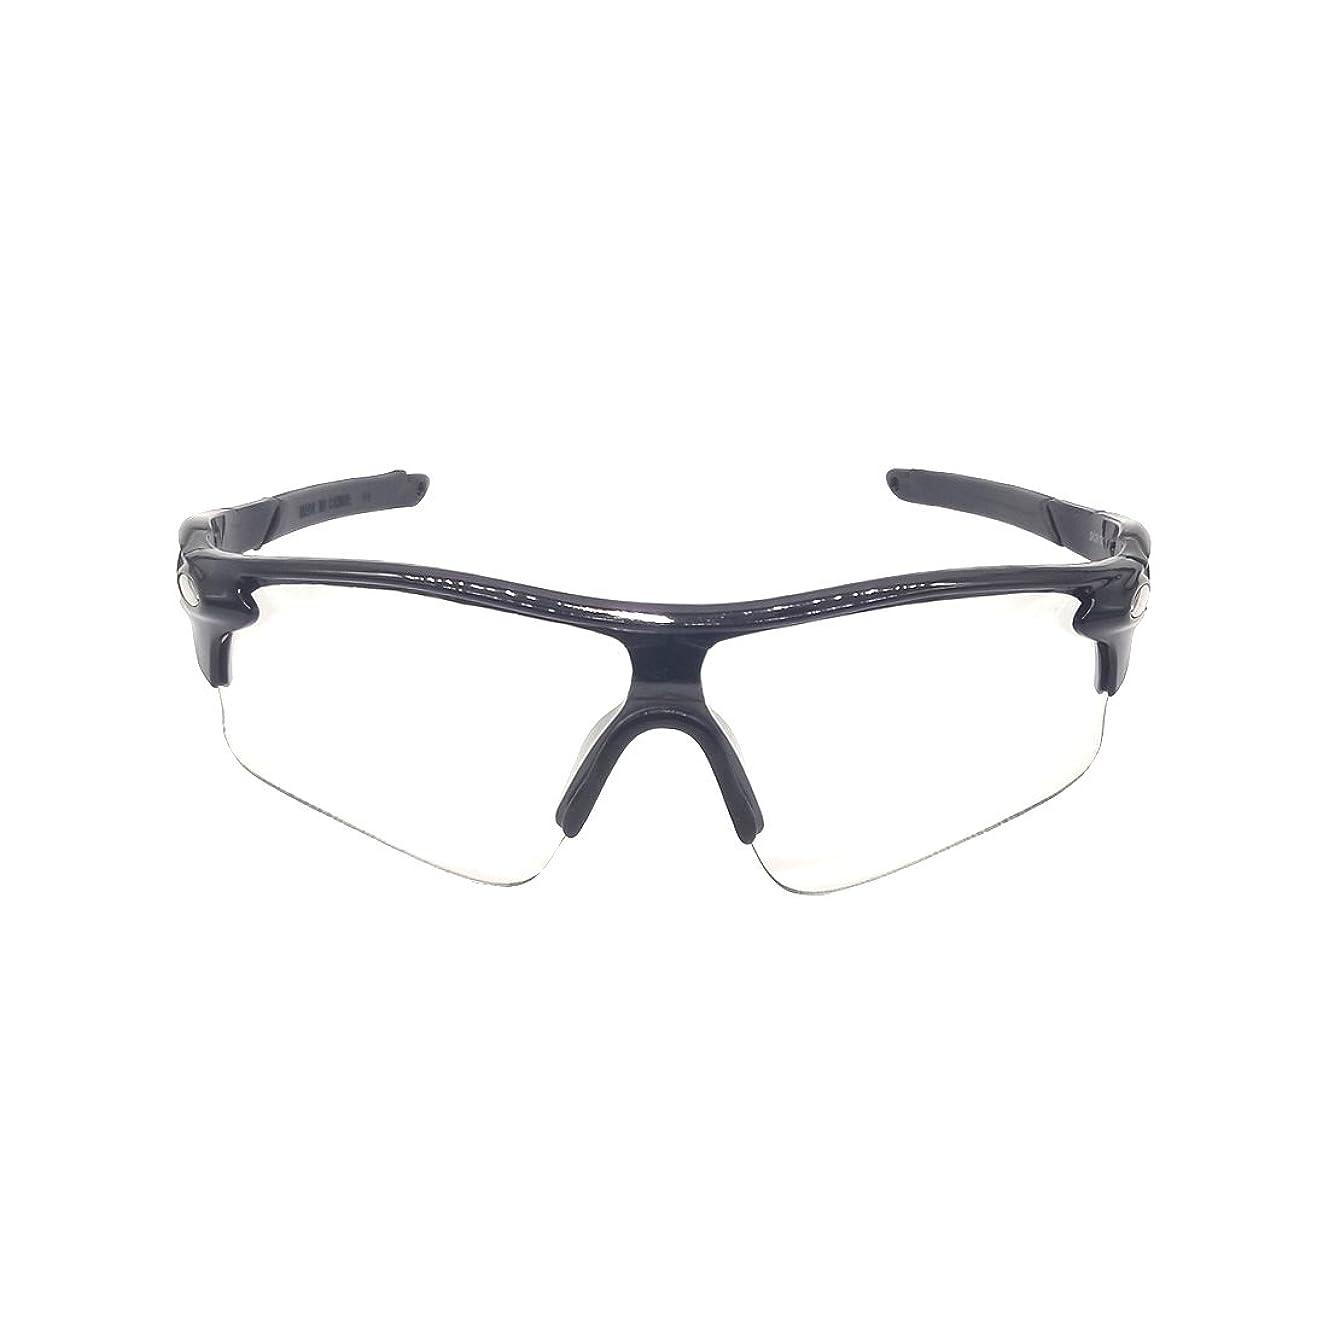 Sekishun-cho Outdoor Sports Cycling Fishing Golf Sunglasses,100% UV Protection